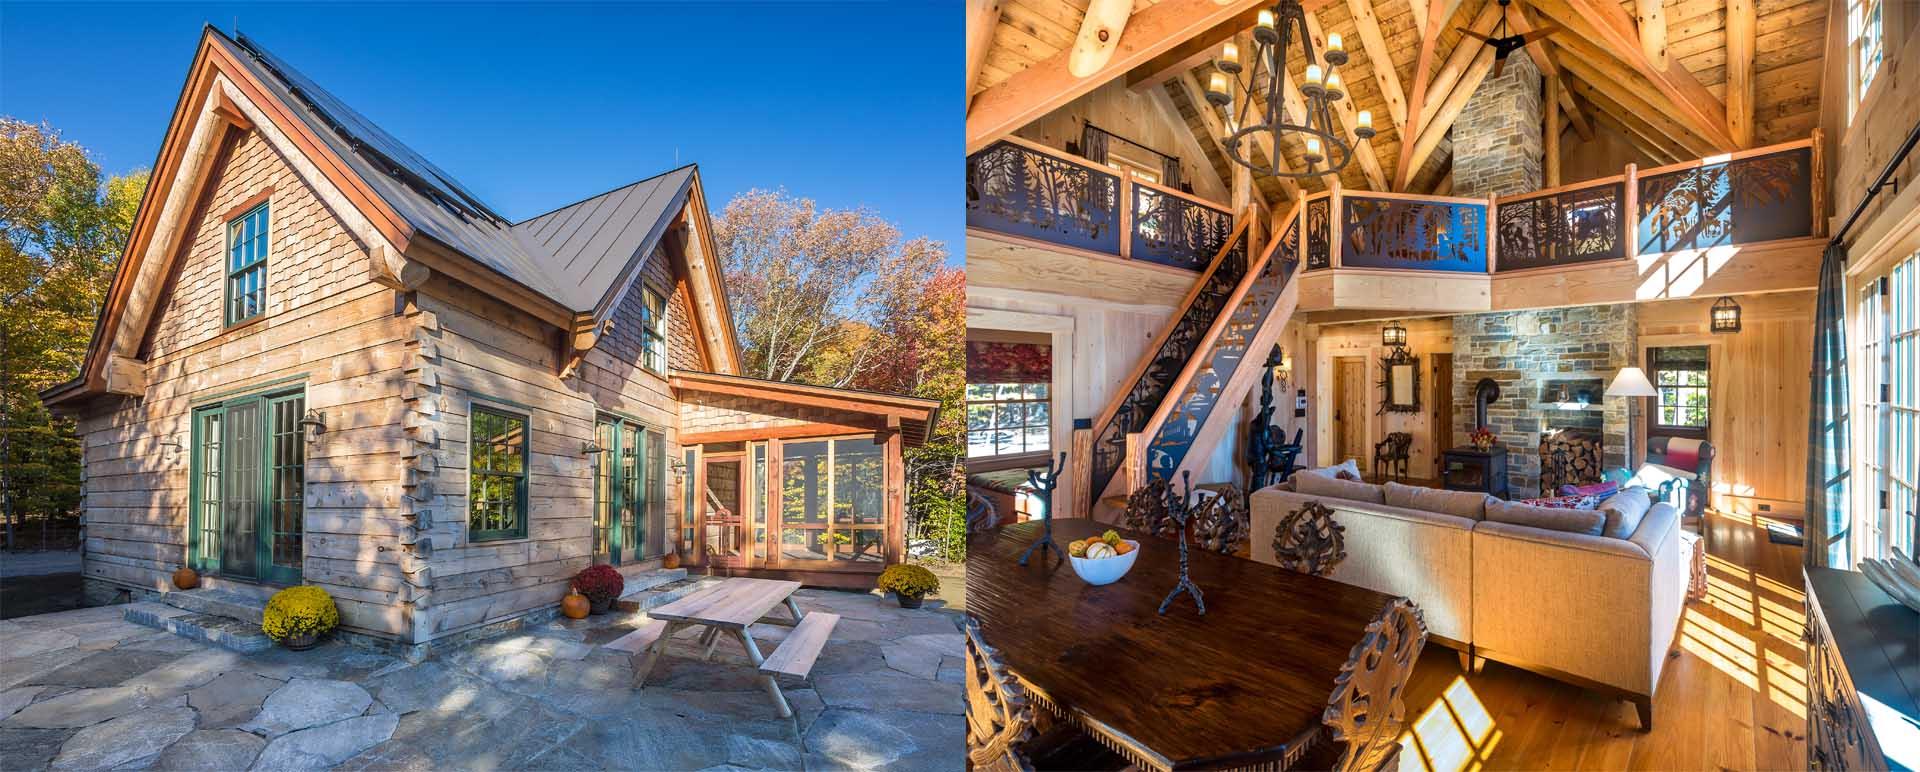 Real log homes log home plans log cabin kits for Luxury log cabin kits